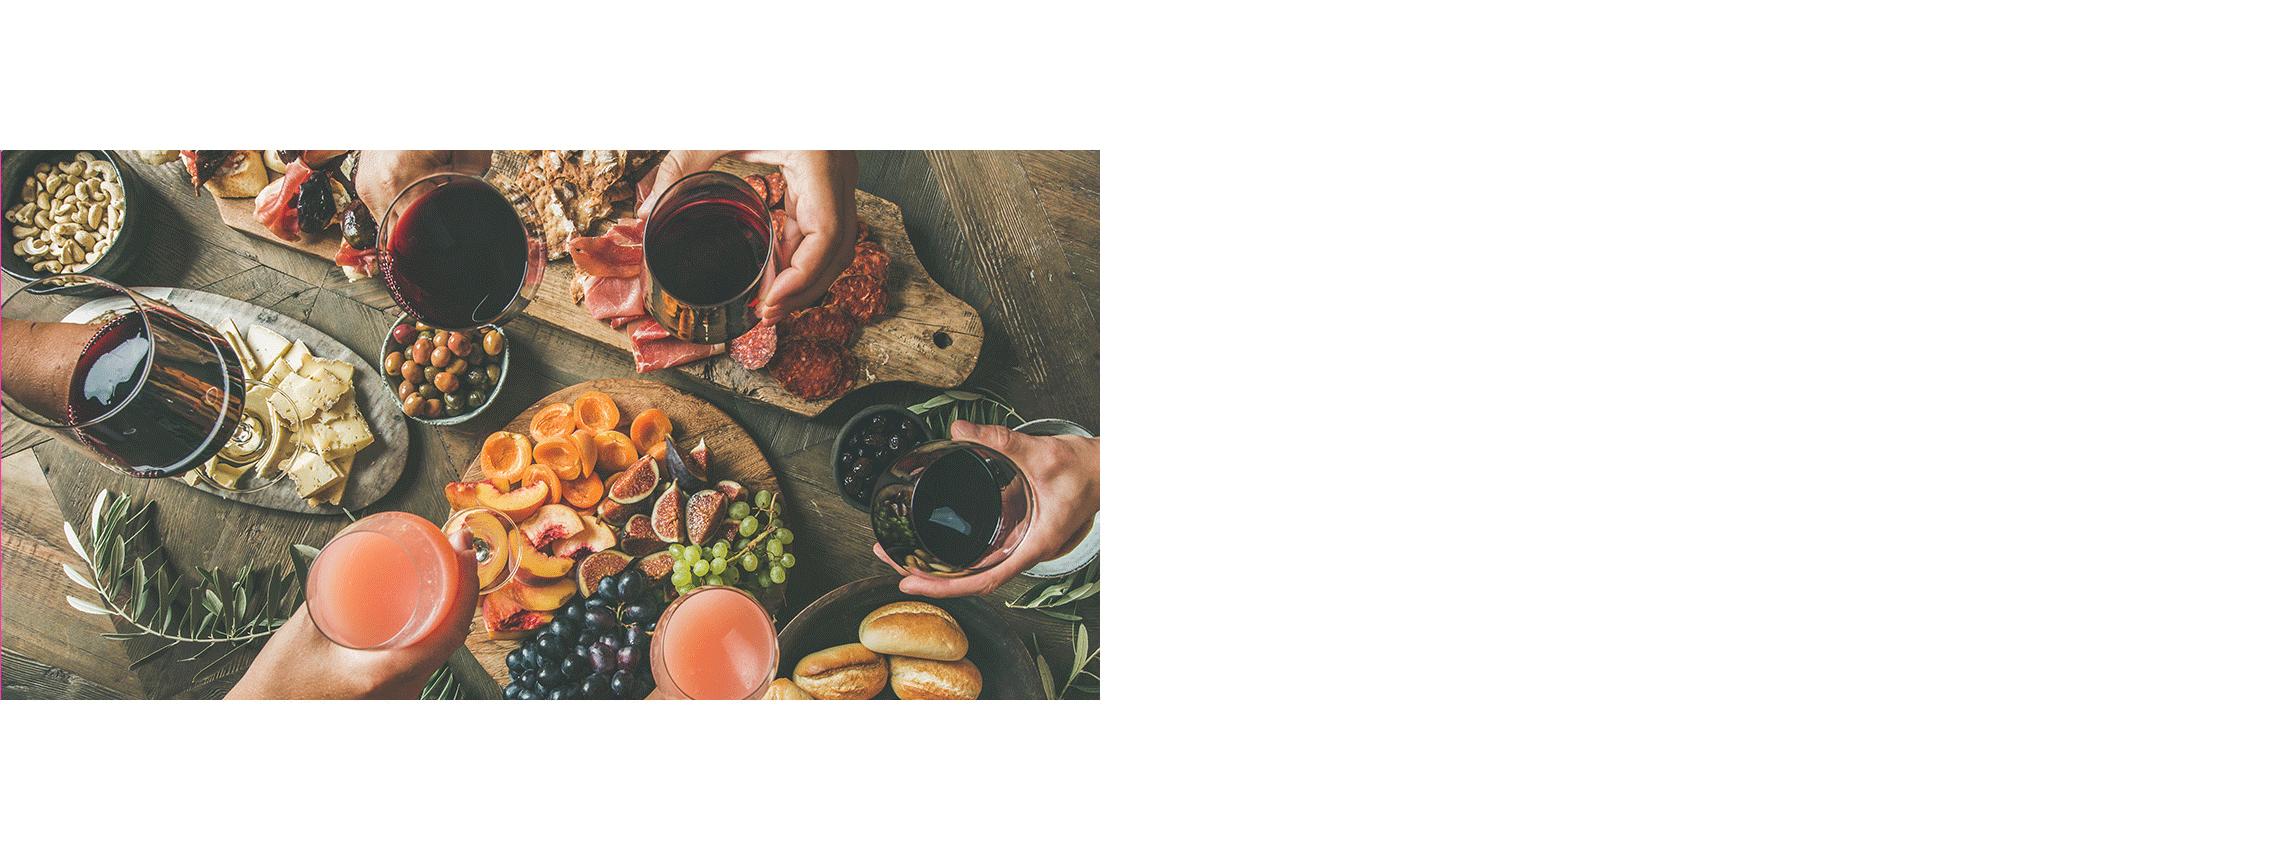 PN_porque_portugal_queijos-conservas-enchidos_2x